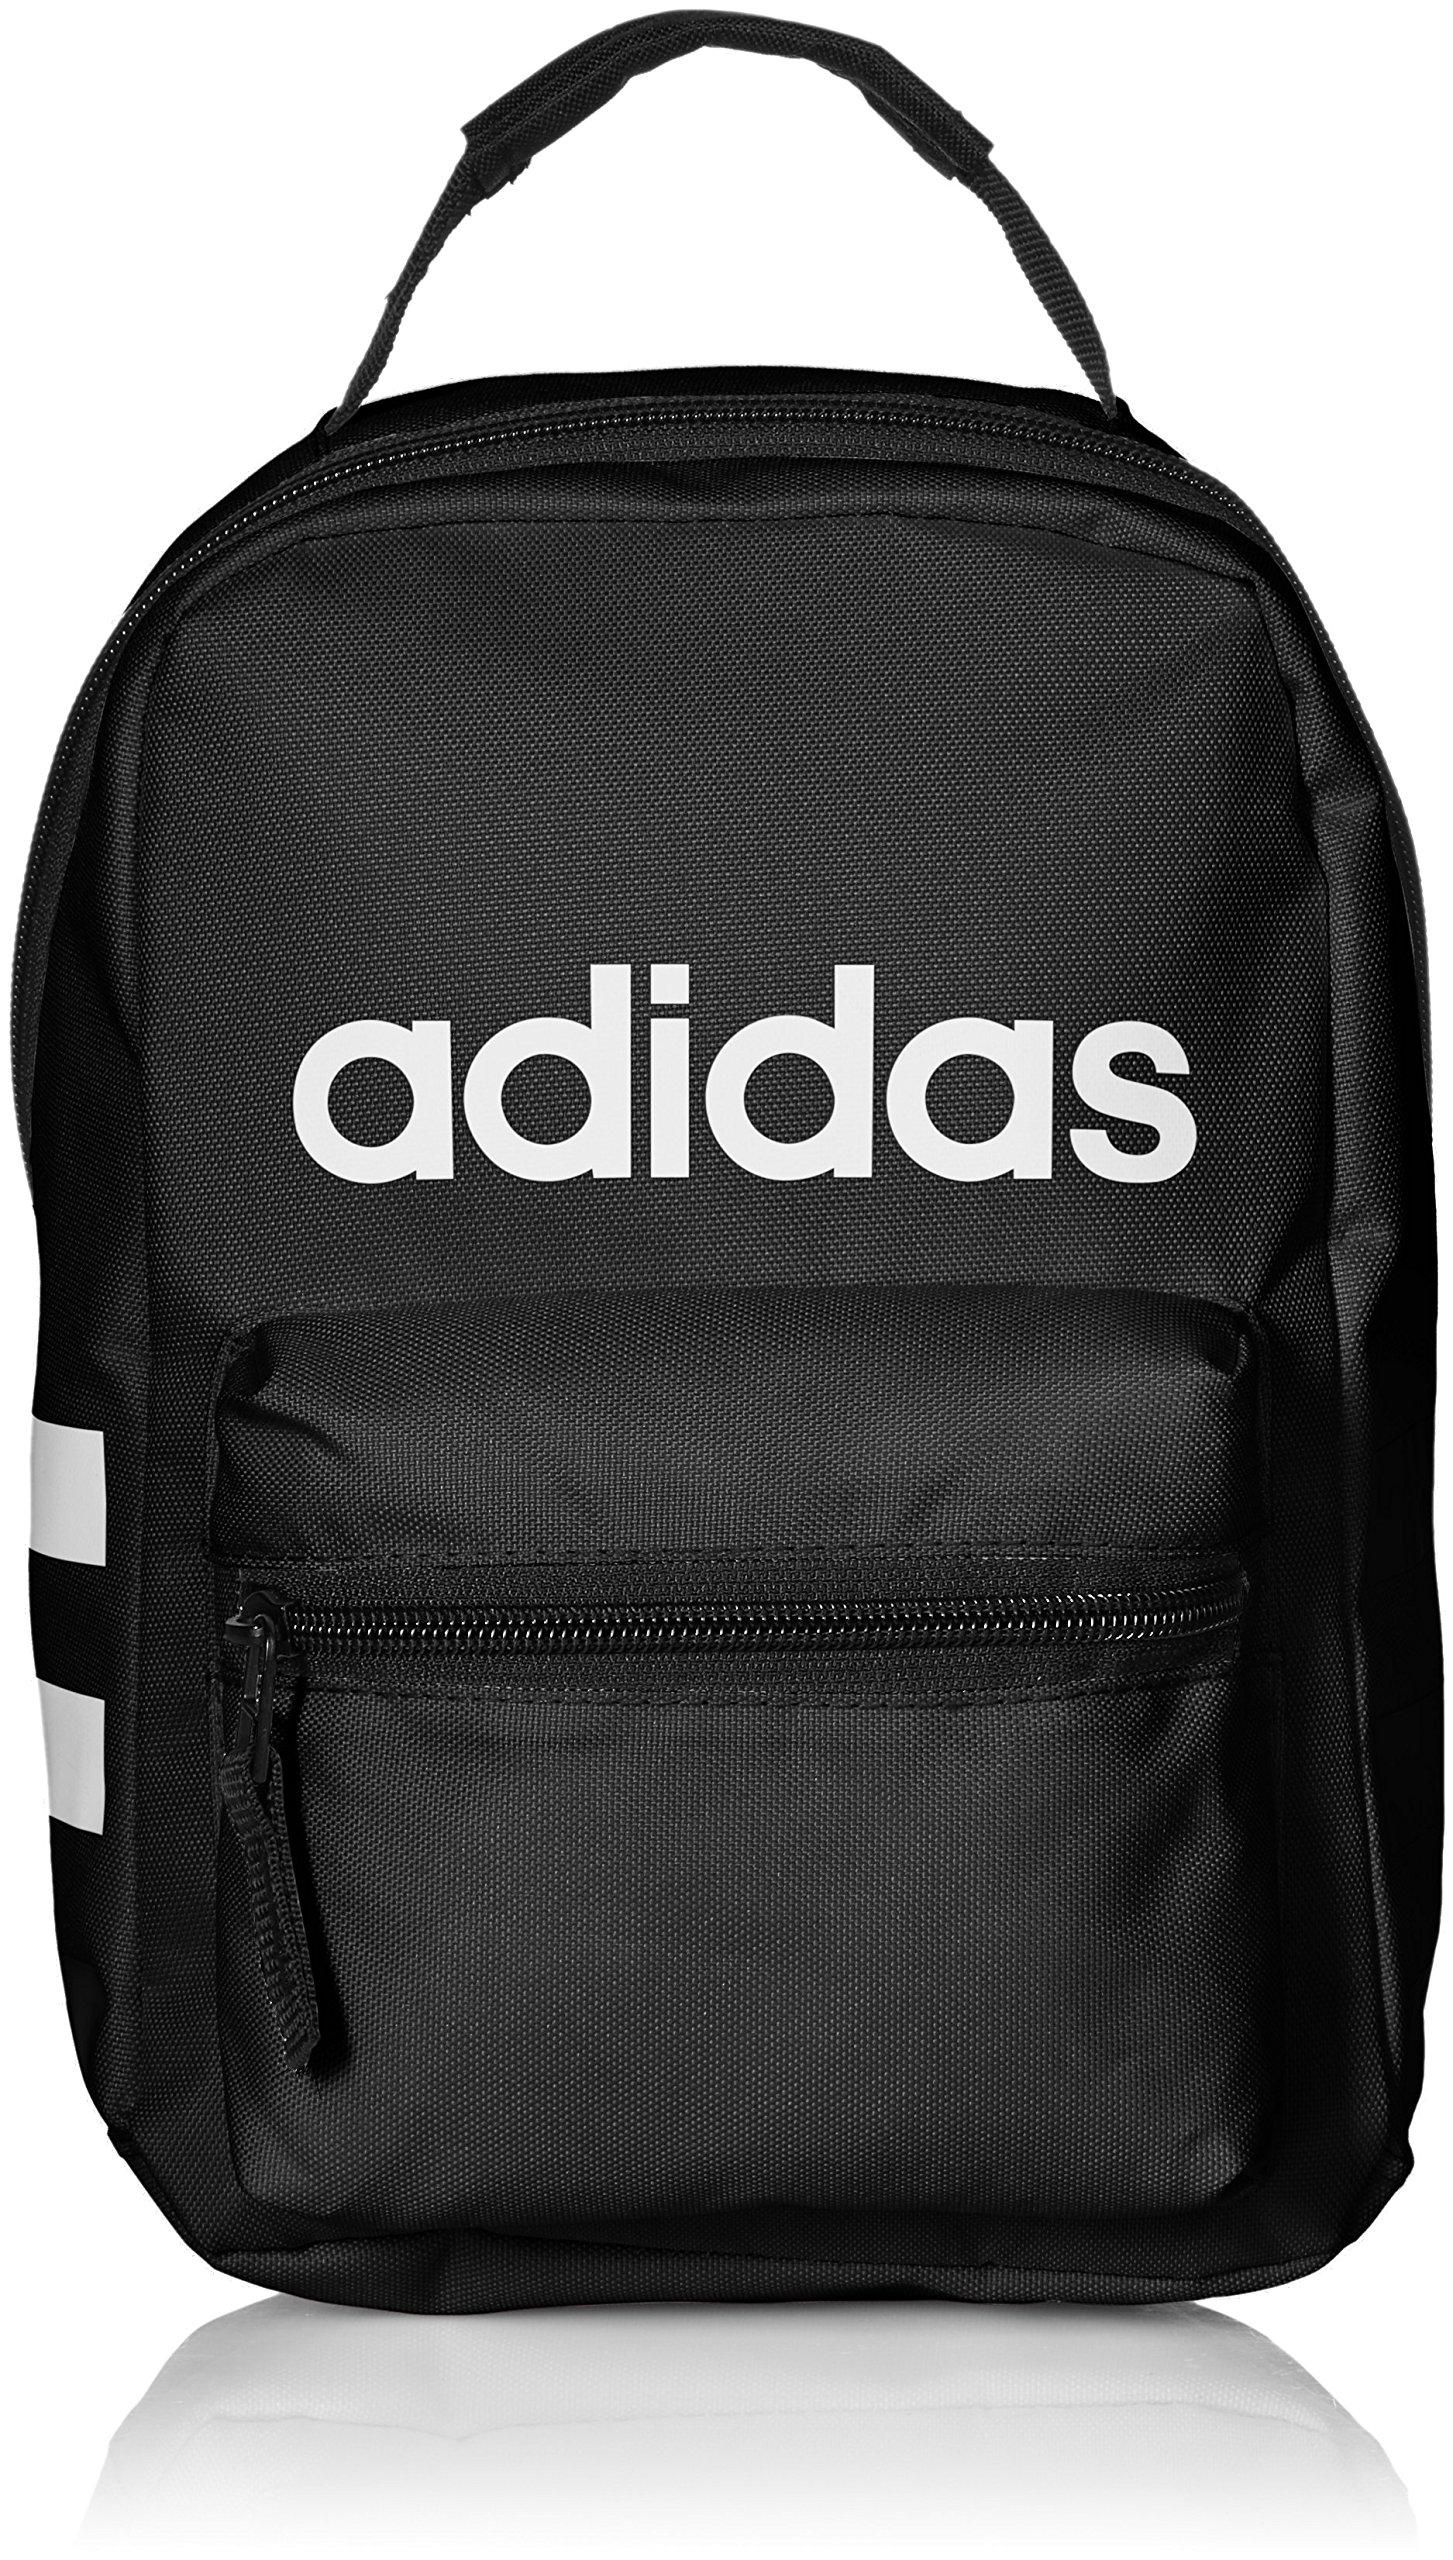 adidas Santiago Lunch Kit, Black/White, One Size